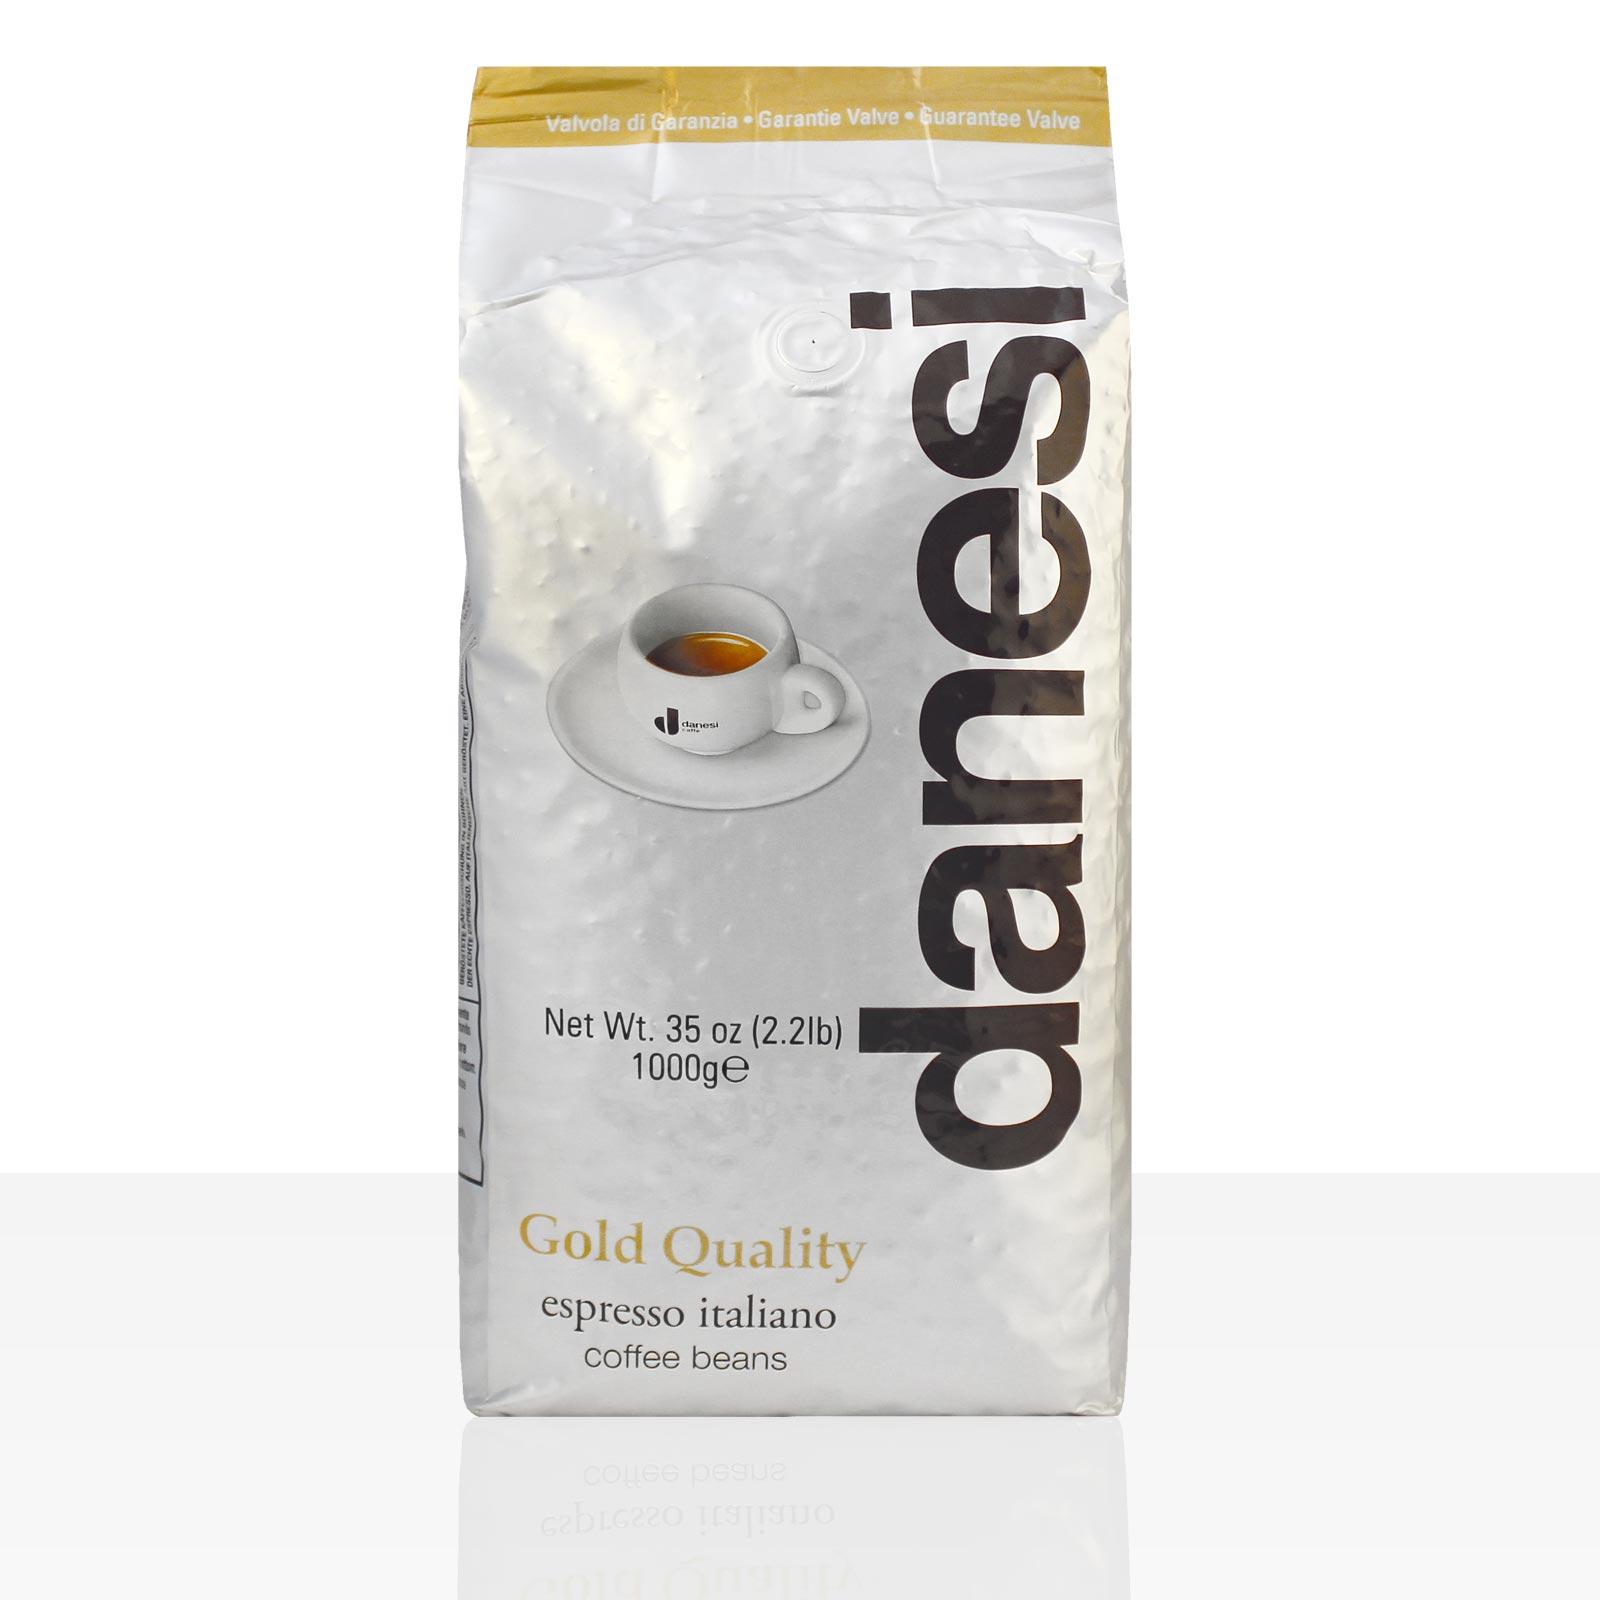 Danesi Caffe Oro Espresso 1kg ganze Bohne, Gold Quality, 100% Arabica